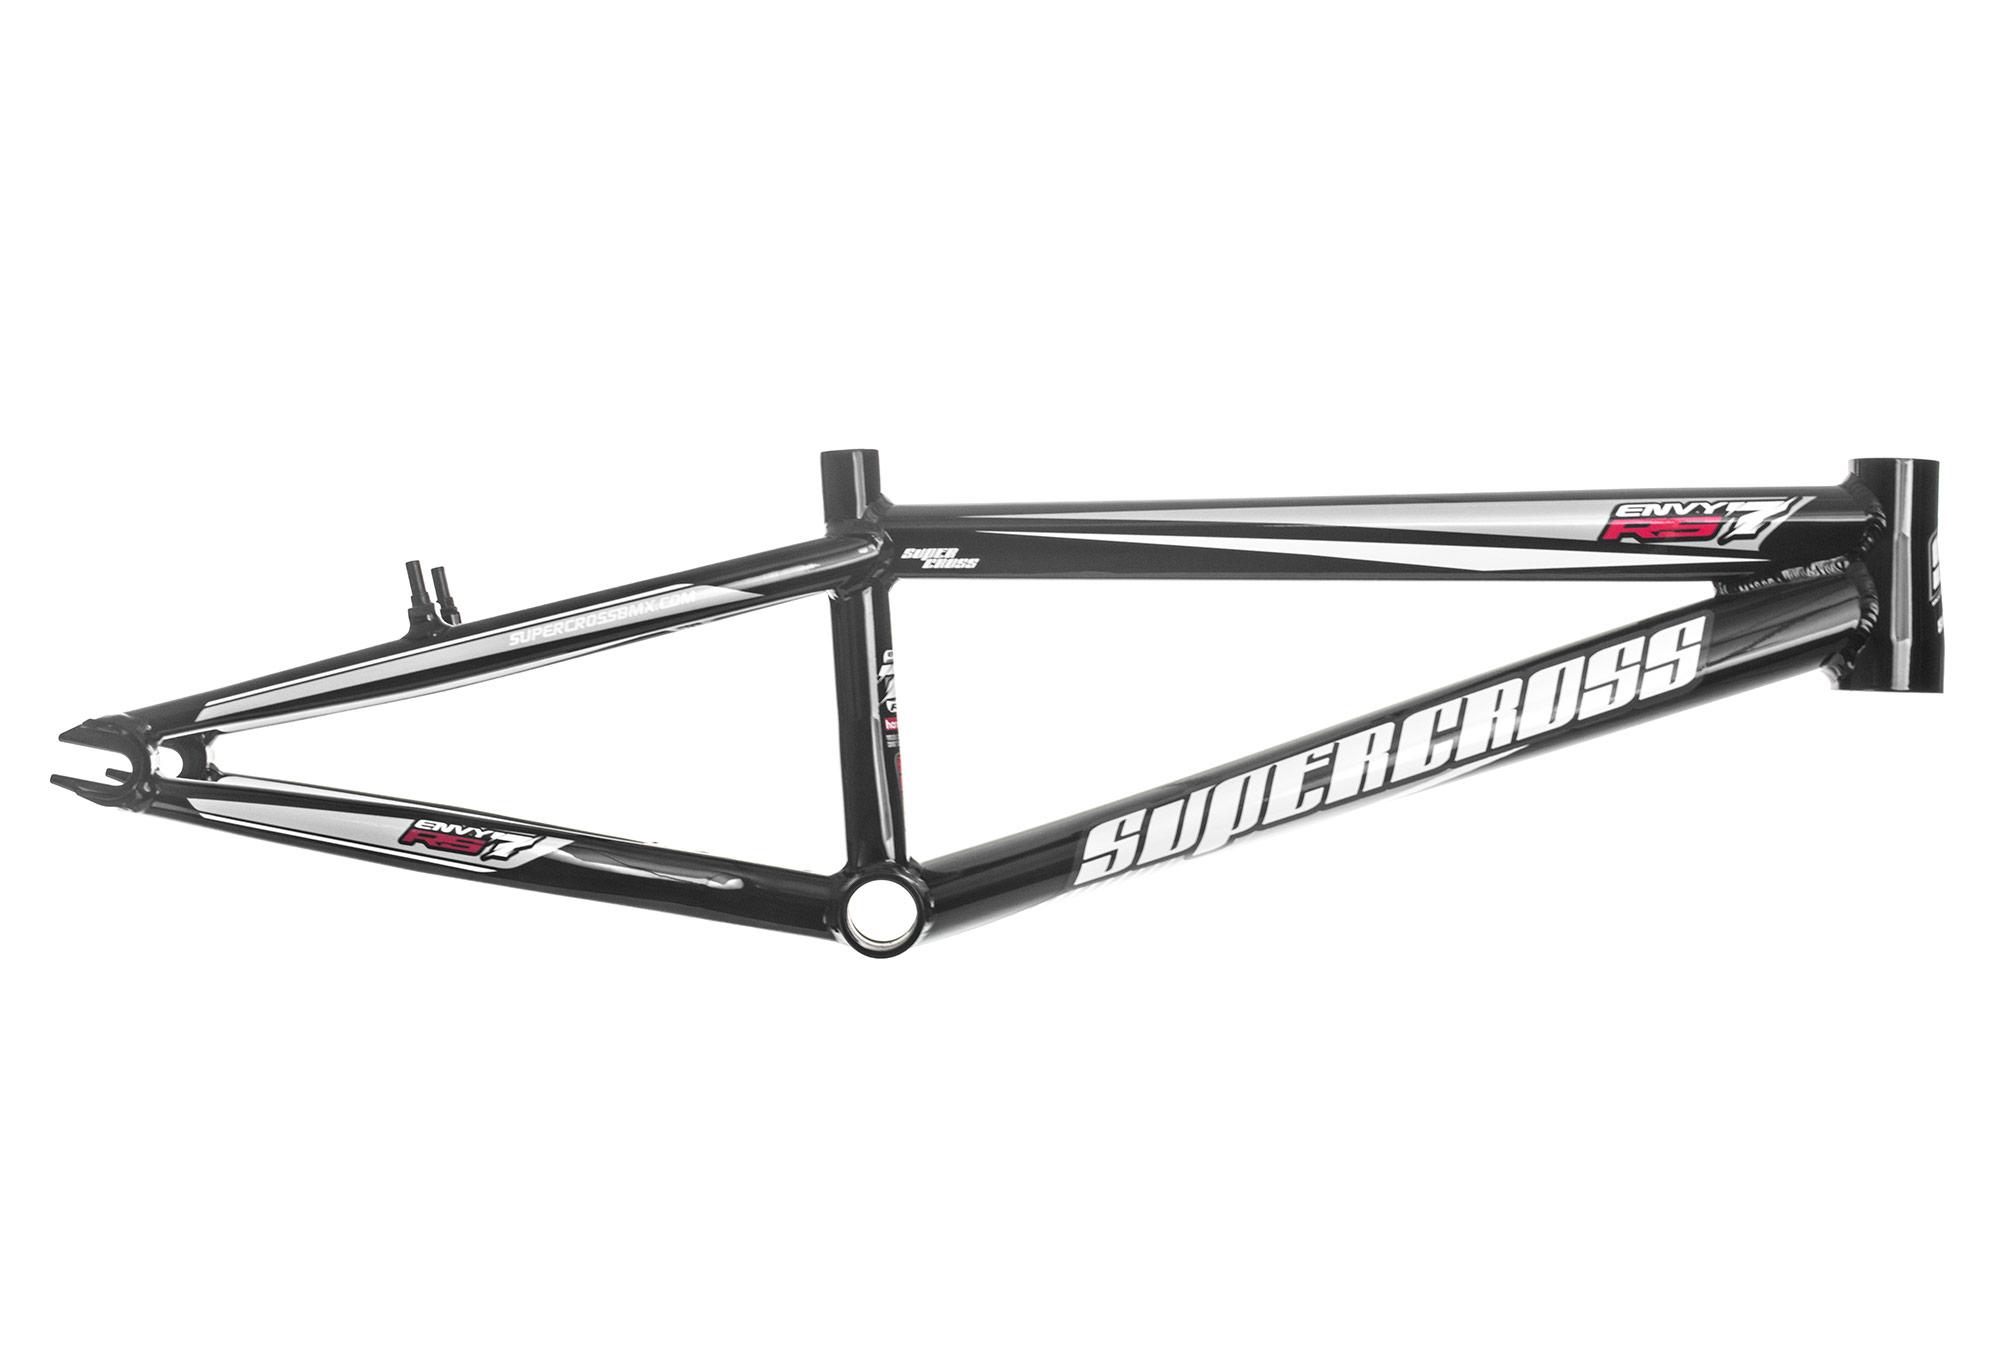 Supercross Envy RS7 BMX Rennrahmen - Schwarz | Alltricks.de